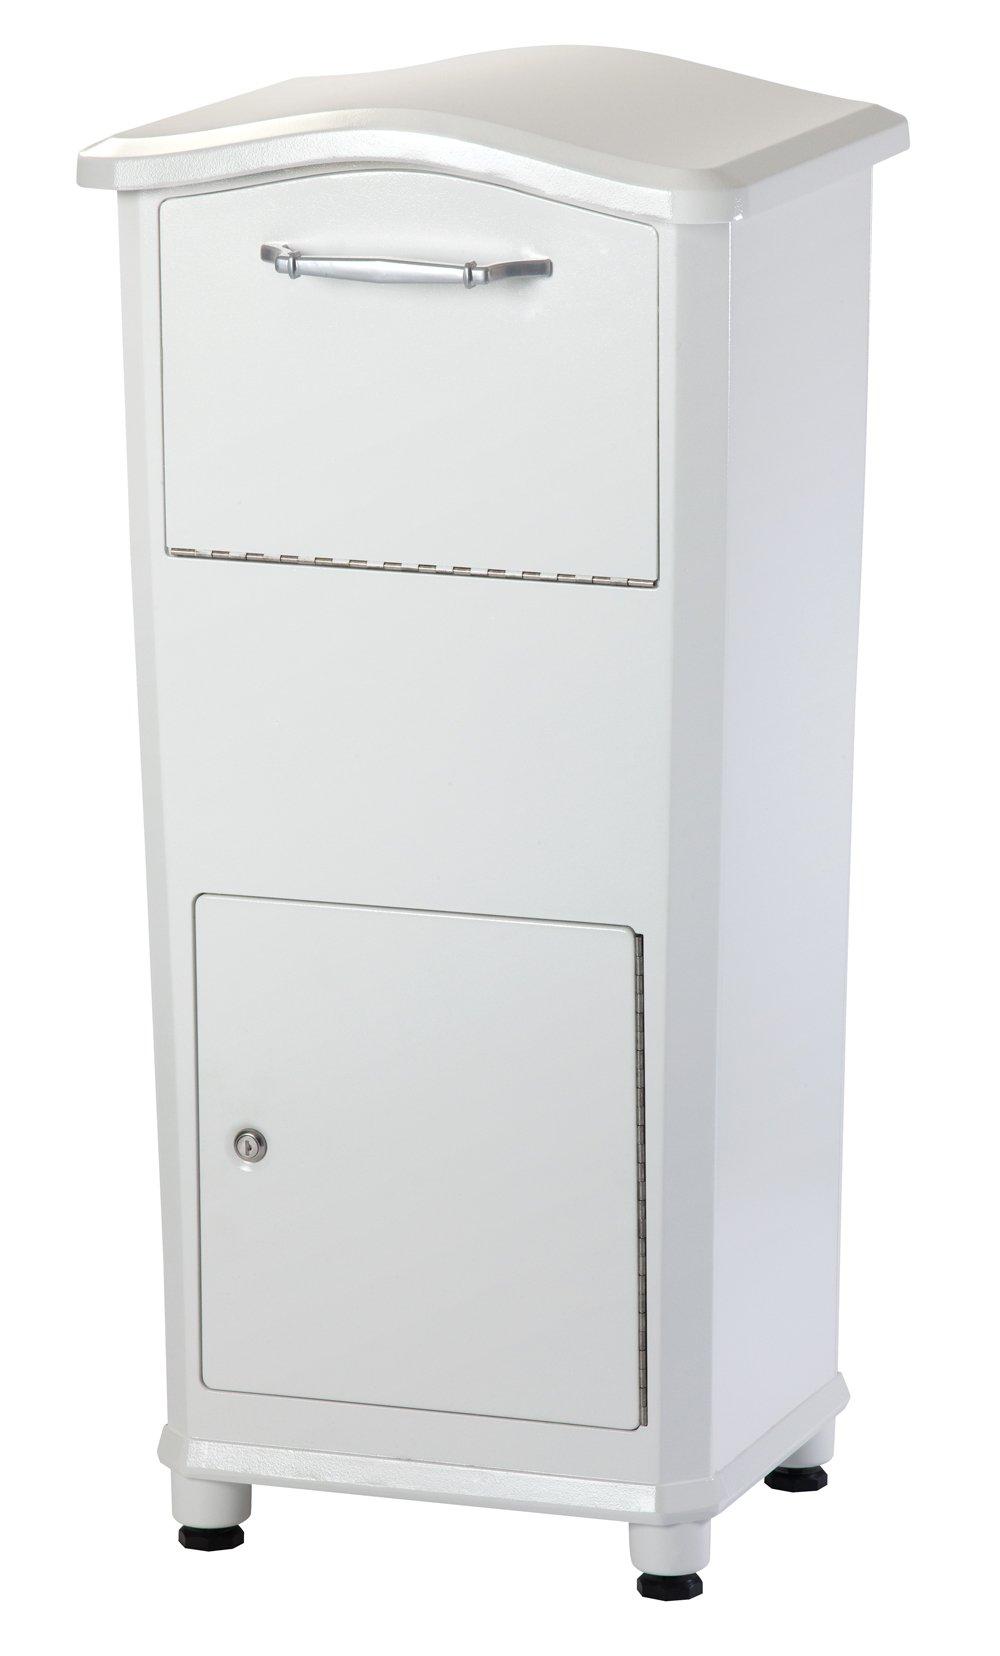 Architectural Mailboxes 6900W Elephantrunk Parcel Drop Box, White